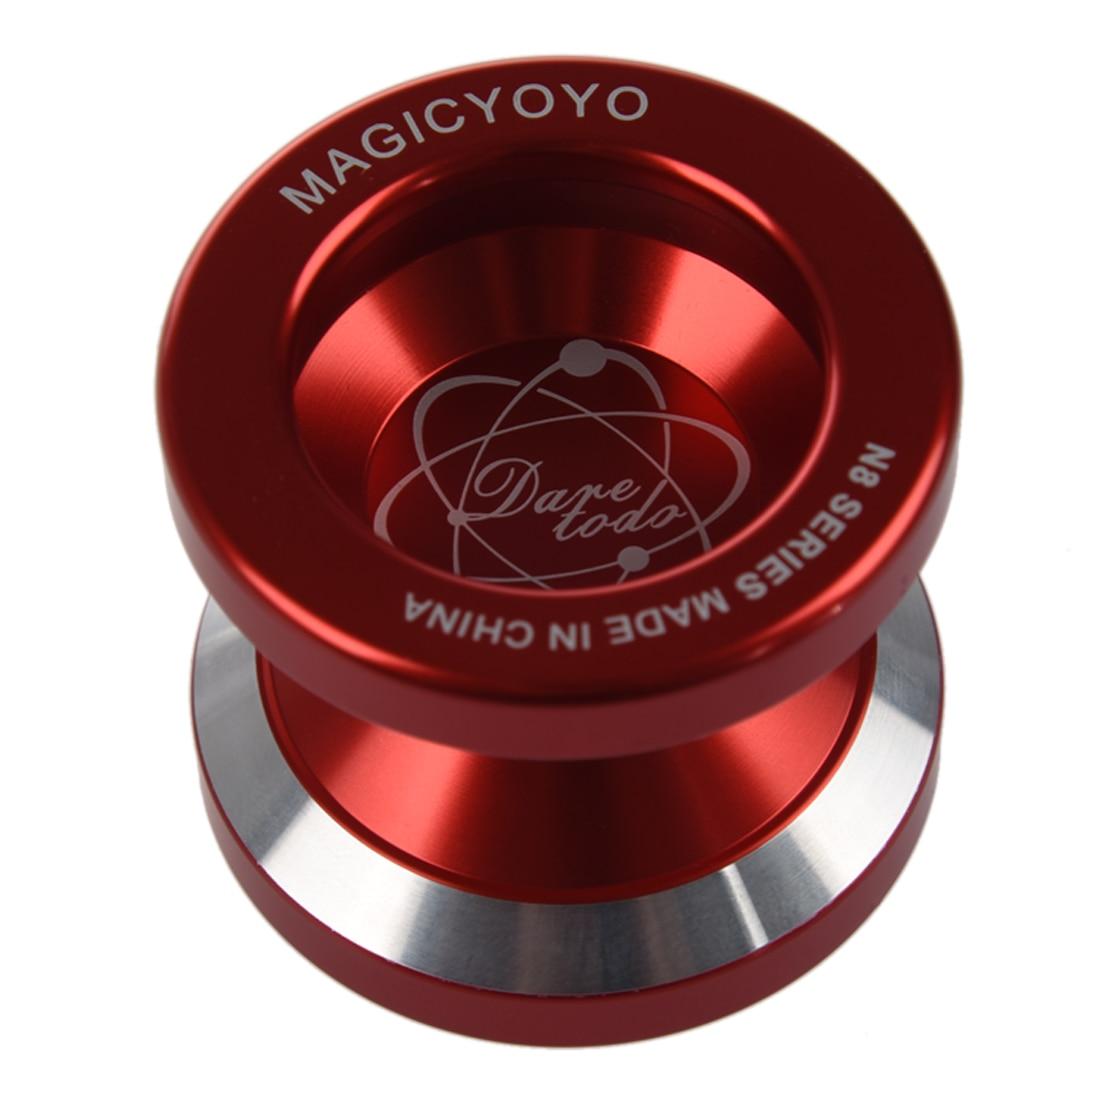 New Magic Yo-Yo N8 Super Professional YoYo + String + Free Bag +Free Glove (Red)